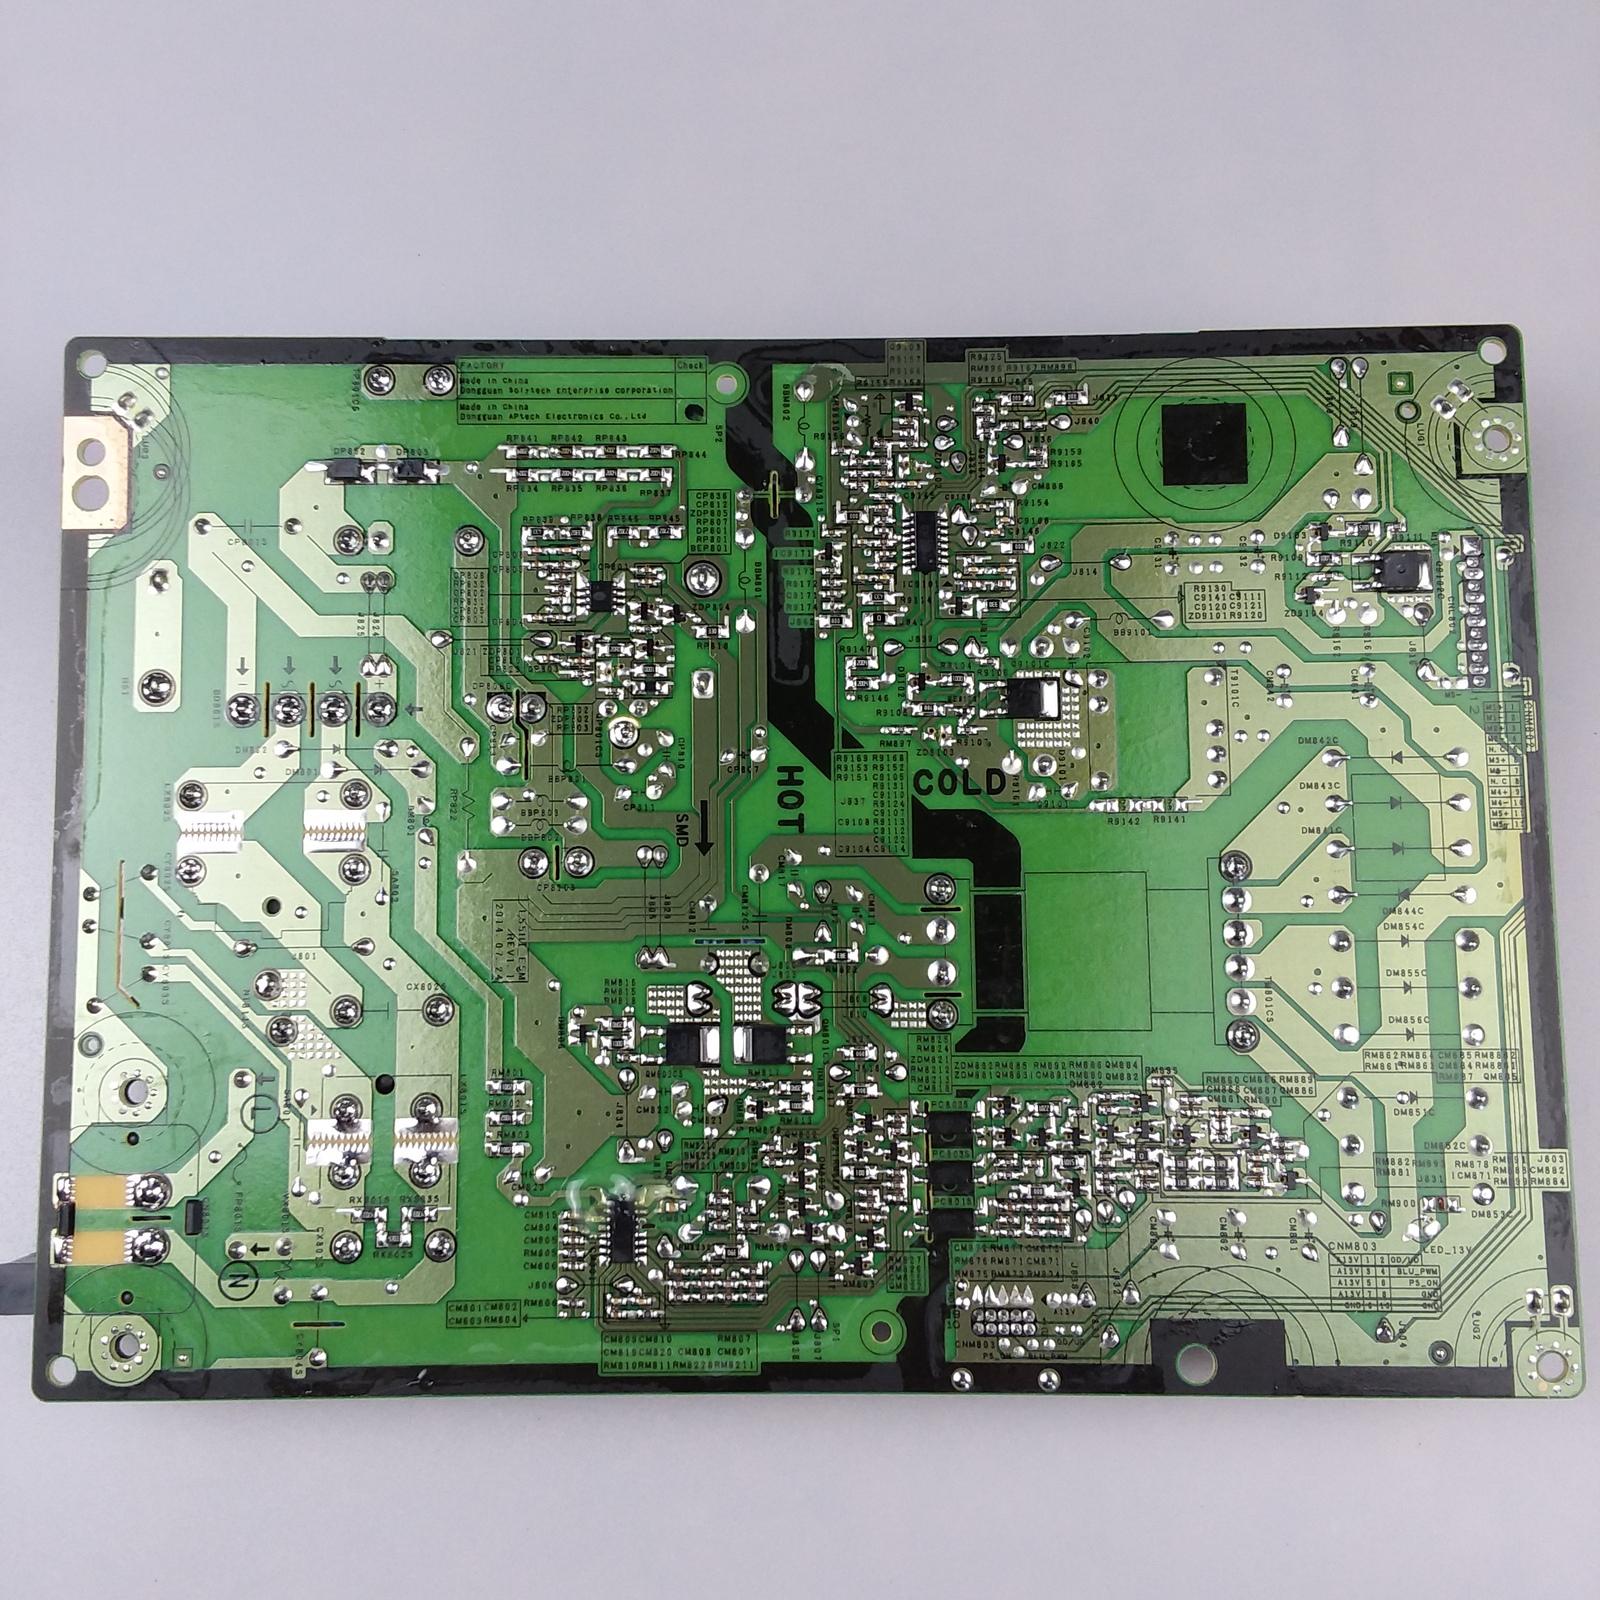 BN44-00774A Samsung Power Supply Board / UN55j6200